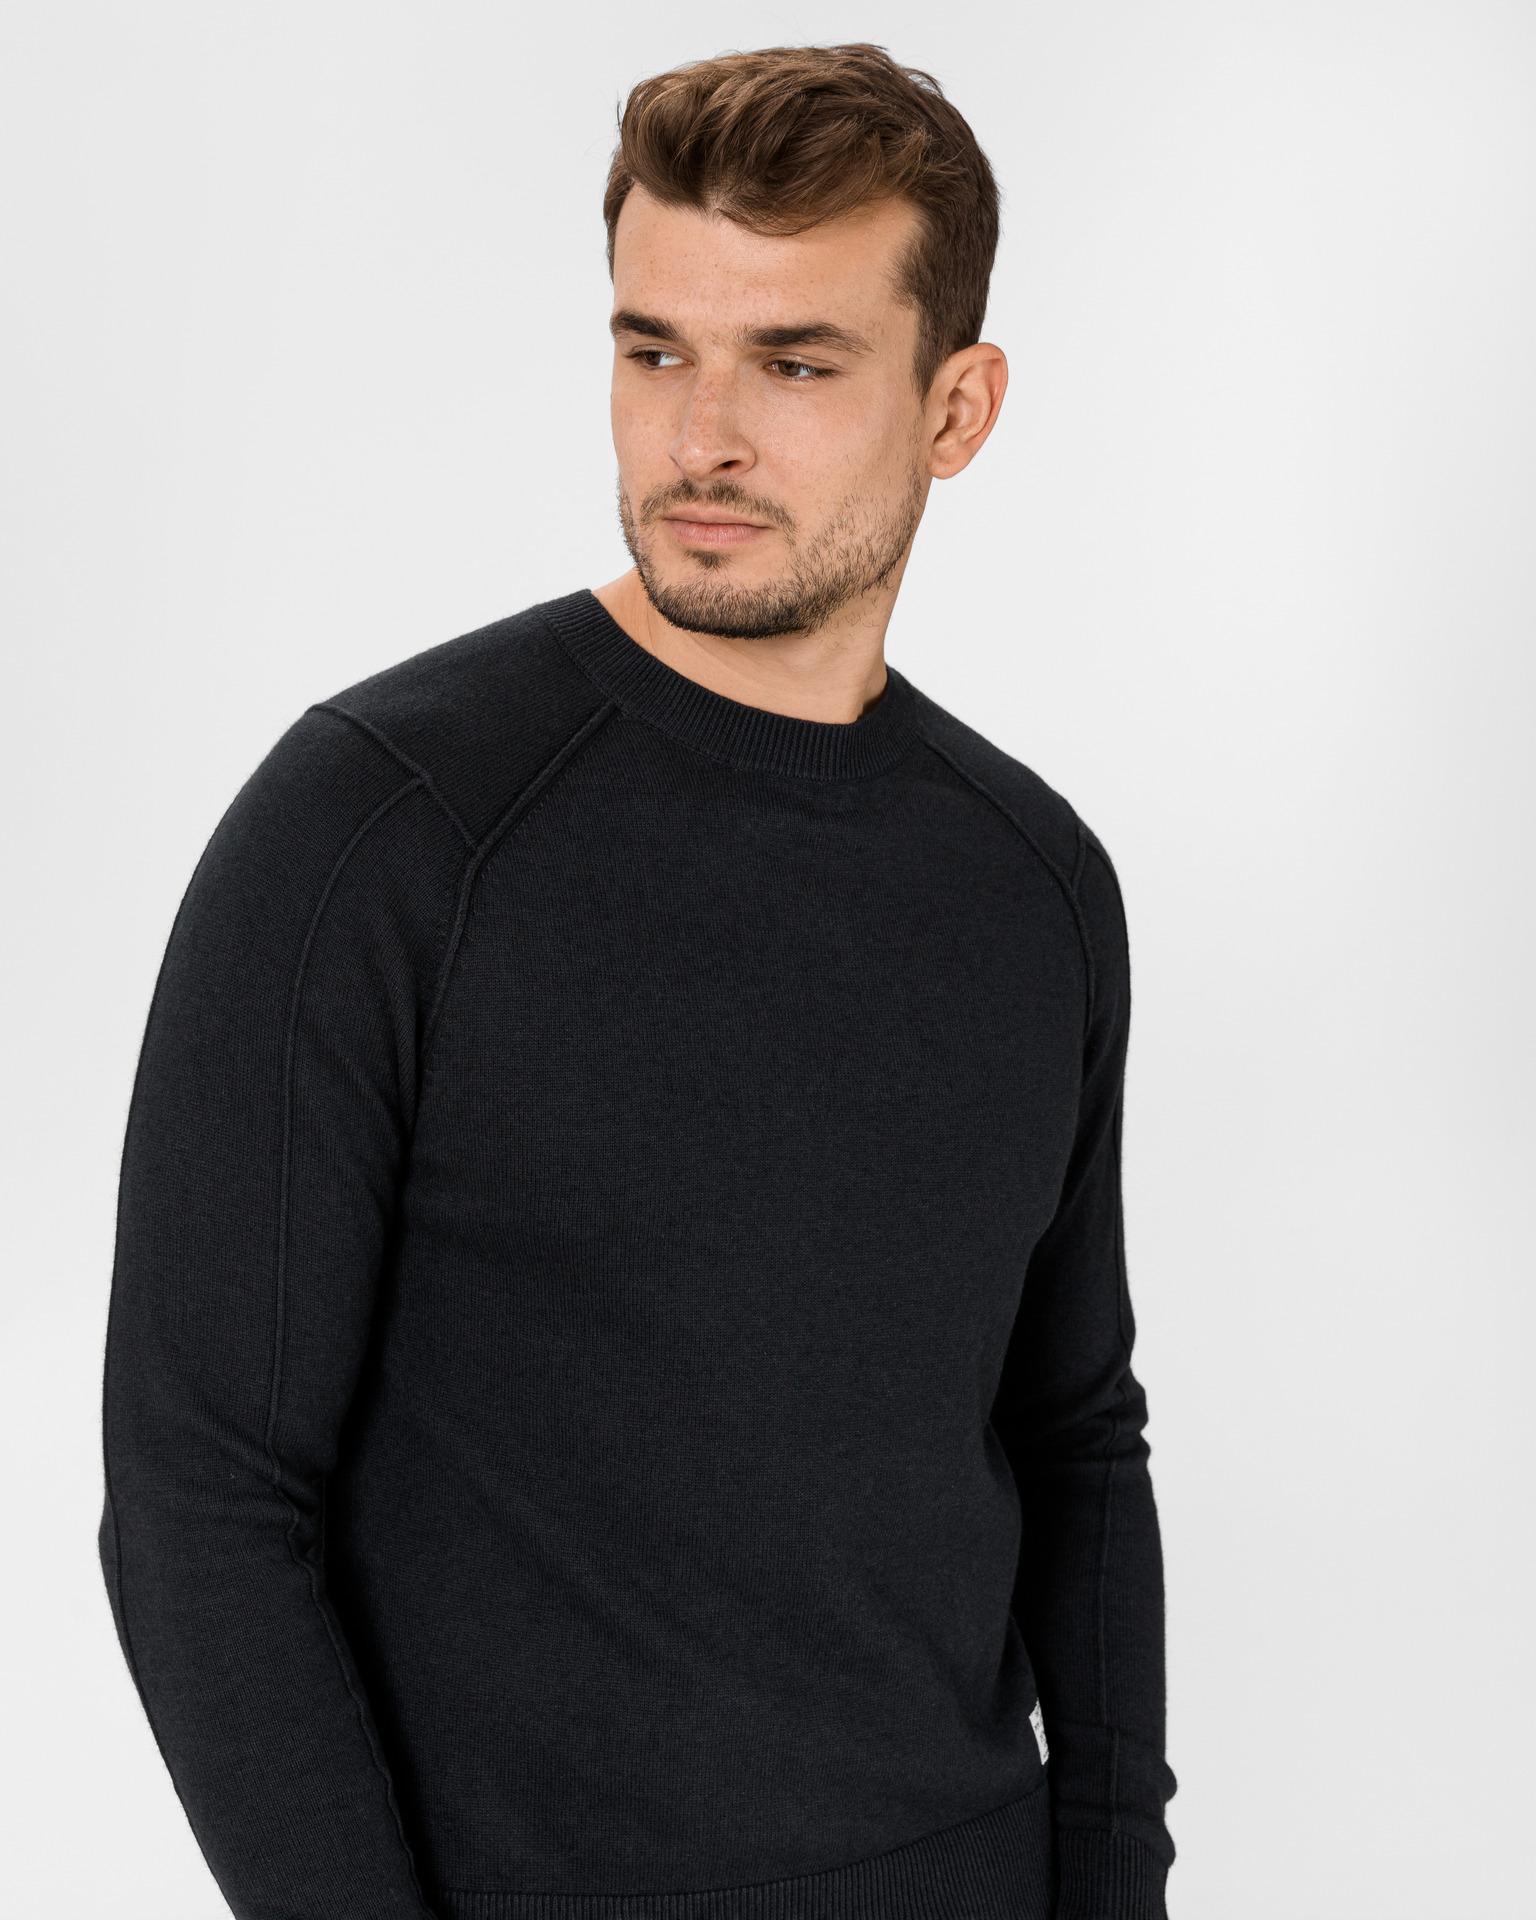 Pepe Jeans Philip Sveter Čierna - M